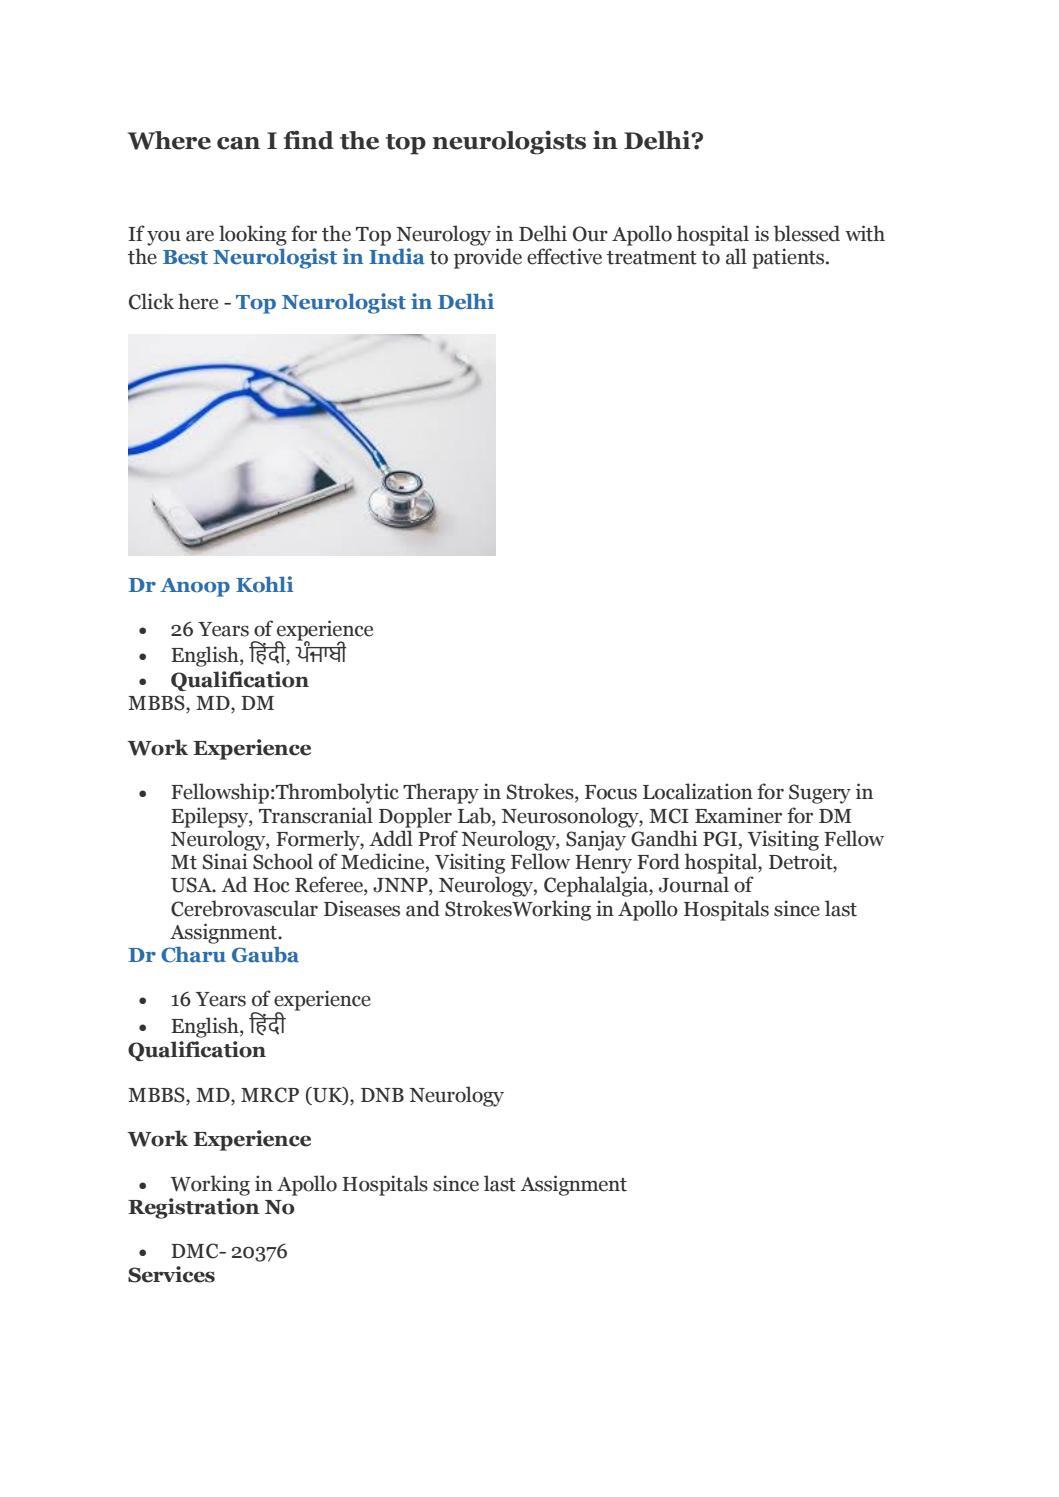 Where can I find the top neurologists in Delhi? by Amar kumar - issuu